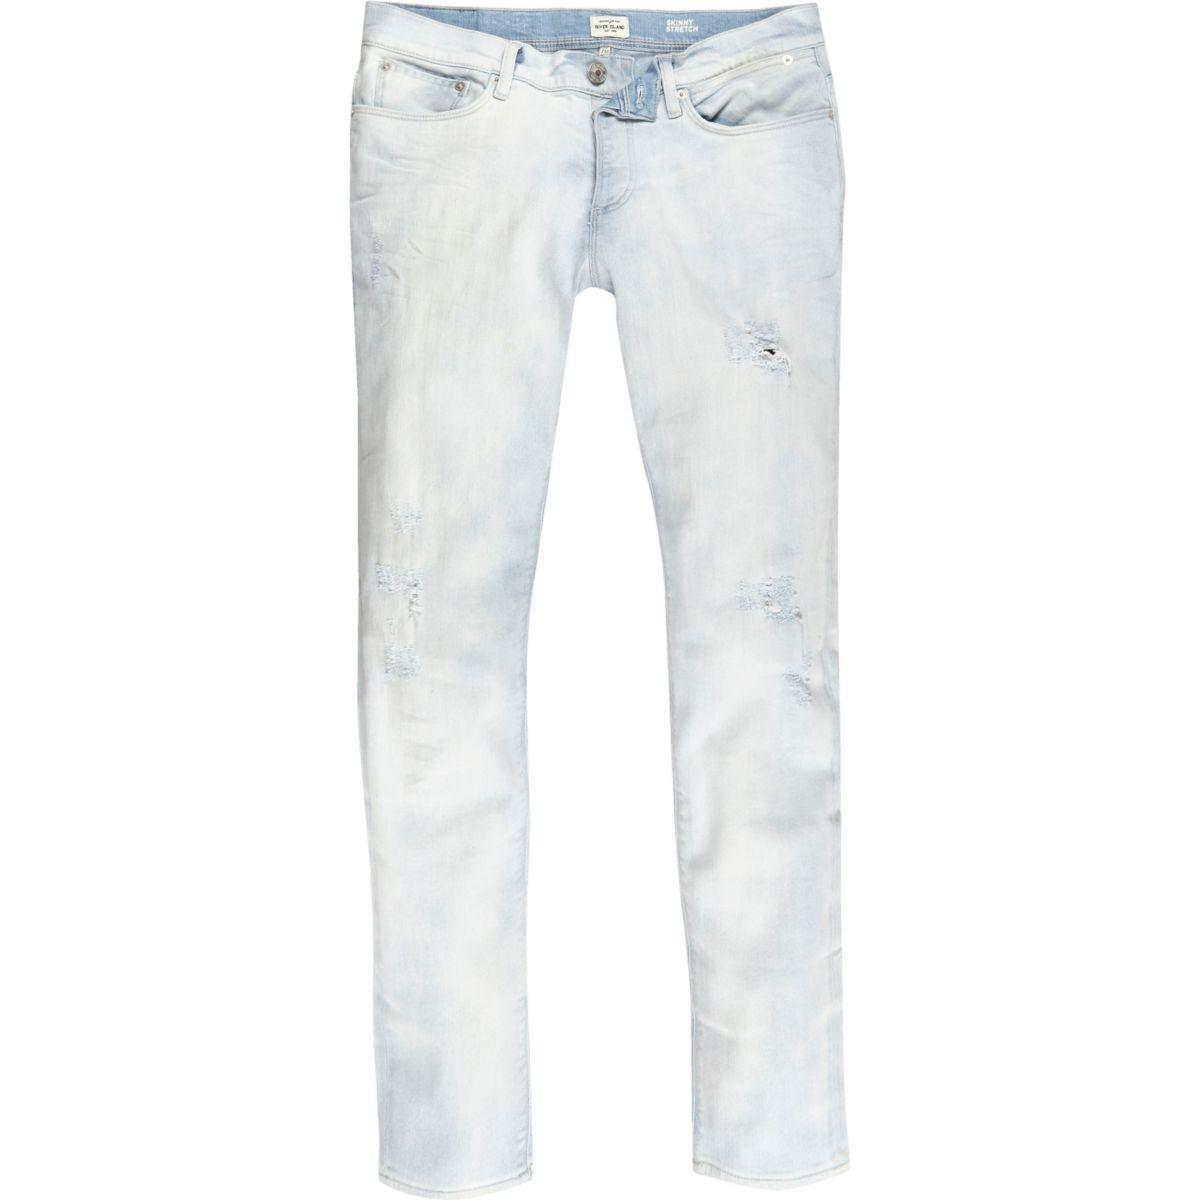 Light blue wash Sid skinny stretch jeans